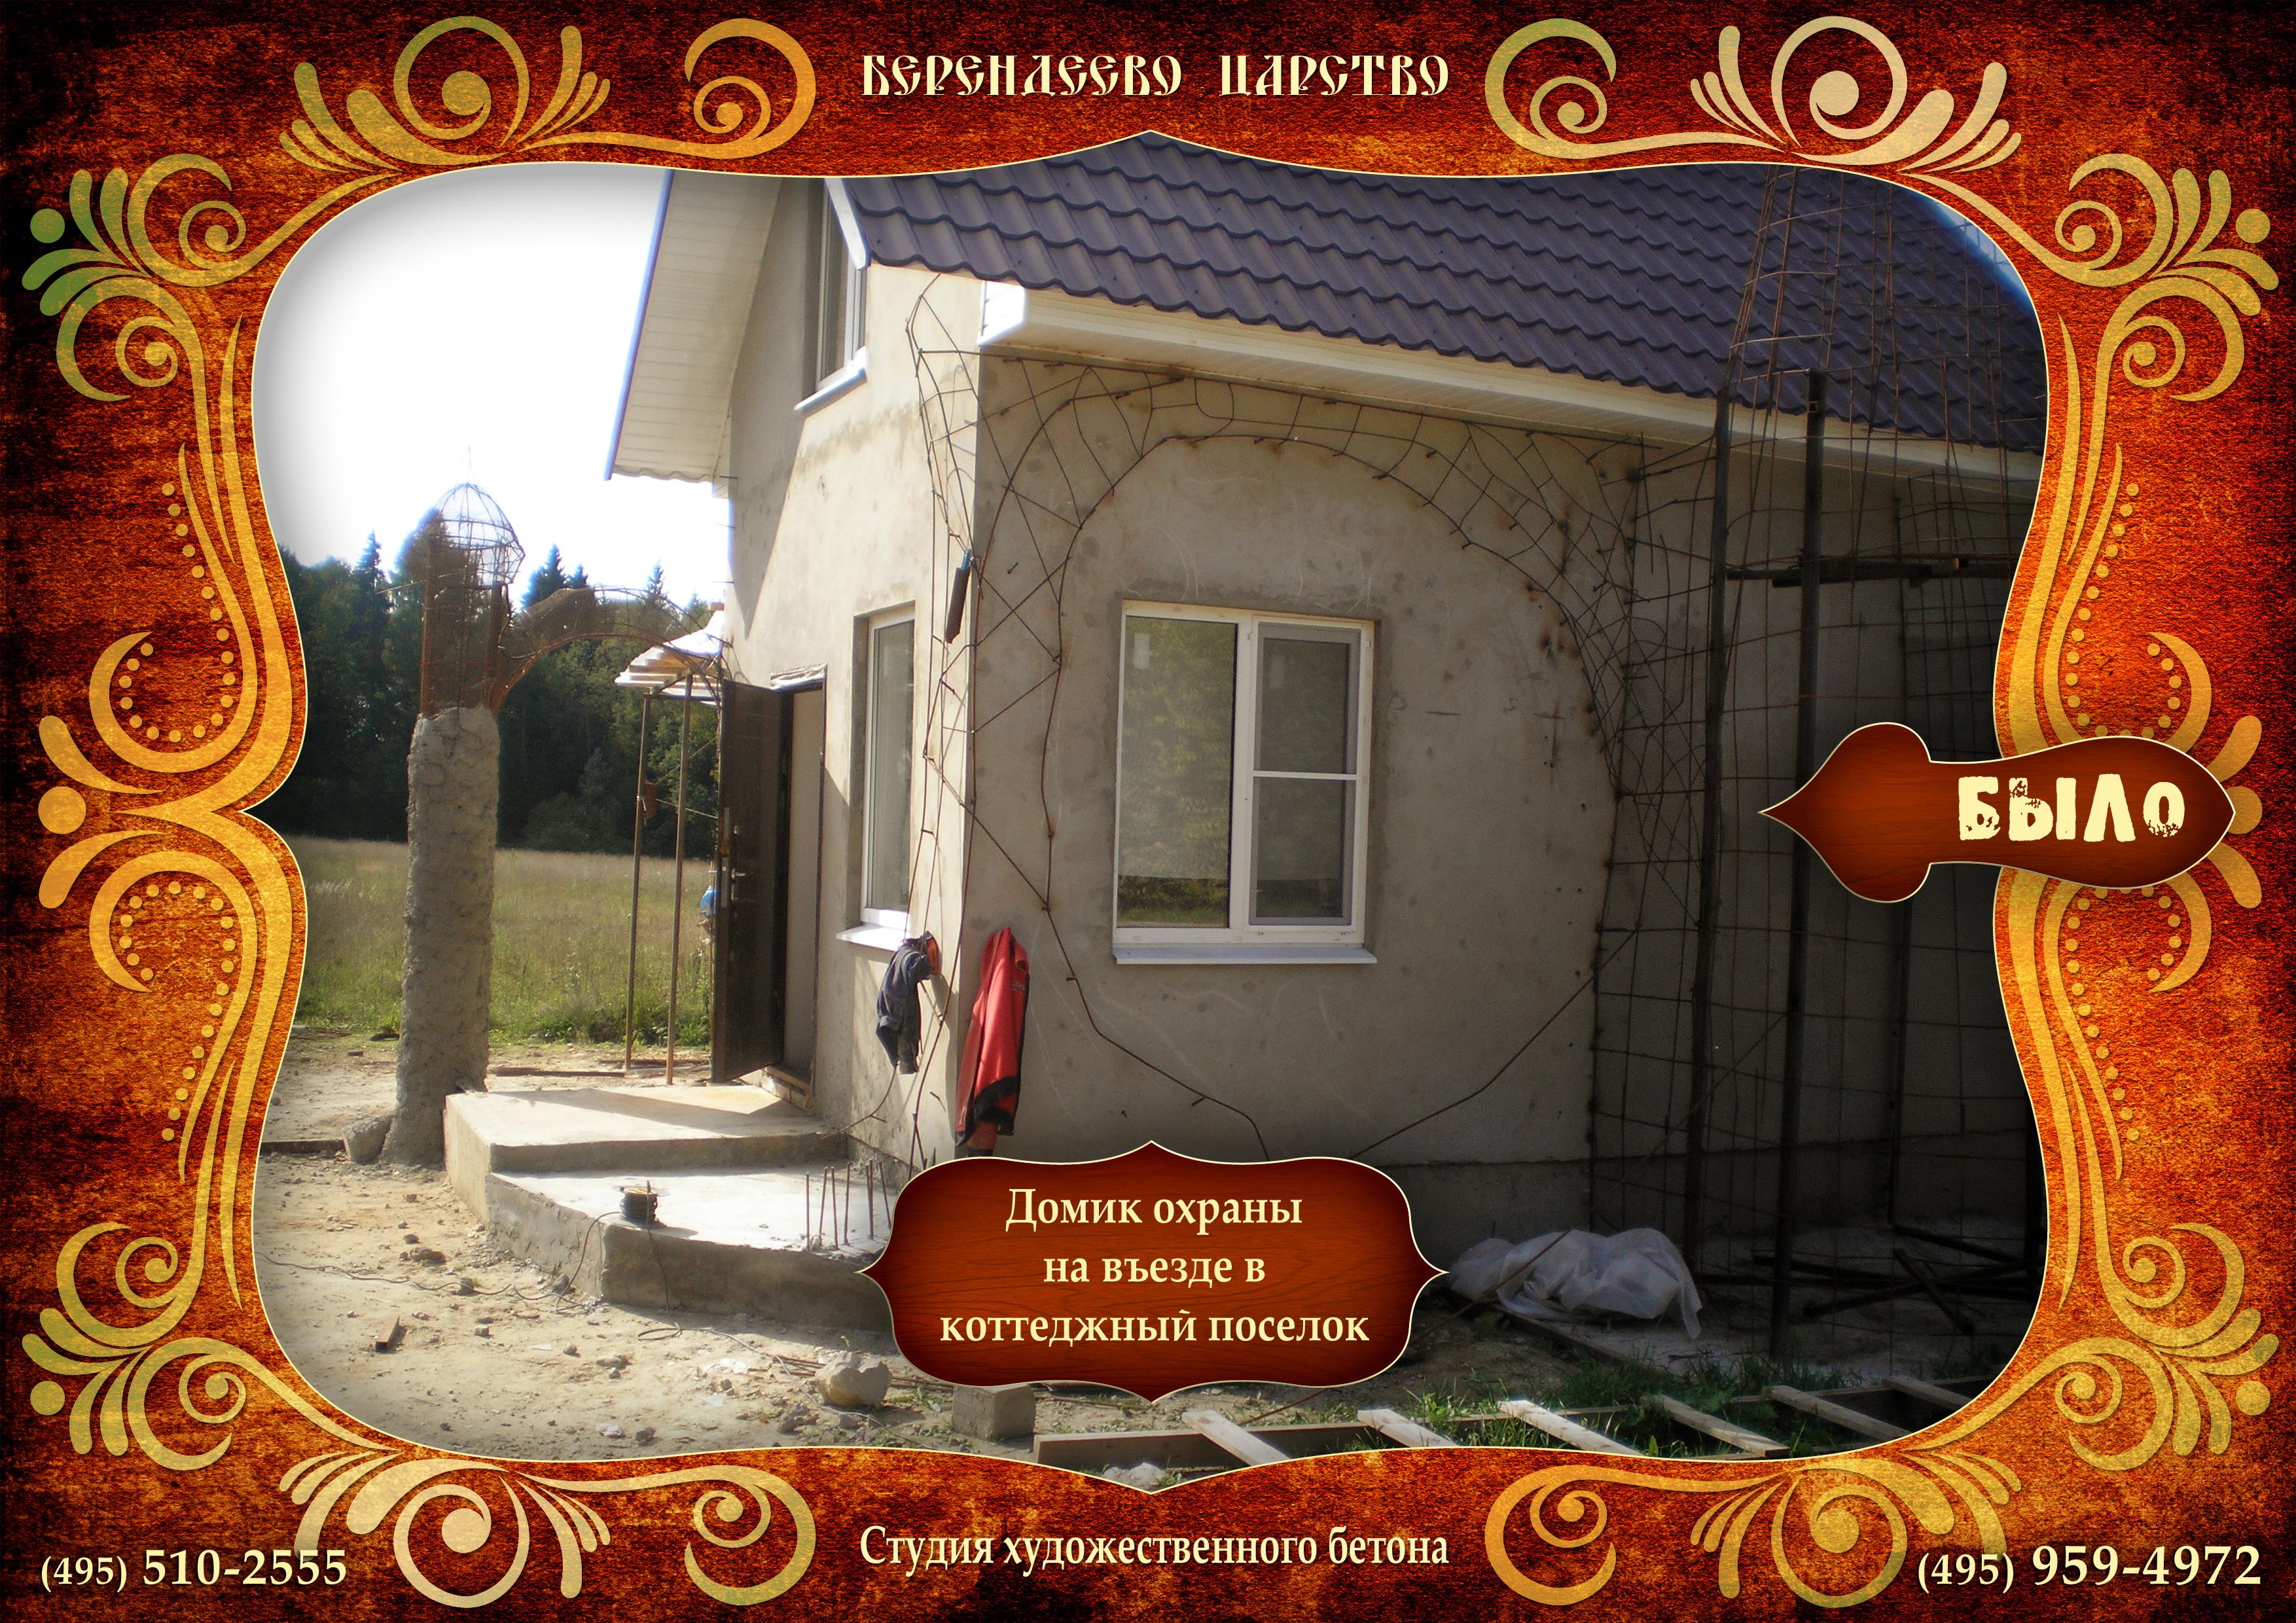 Catalog_0022.jpg